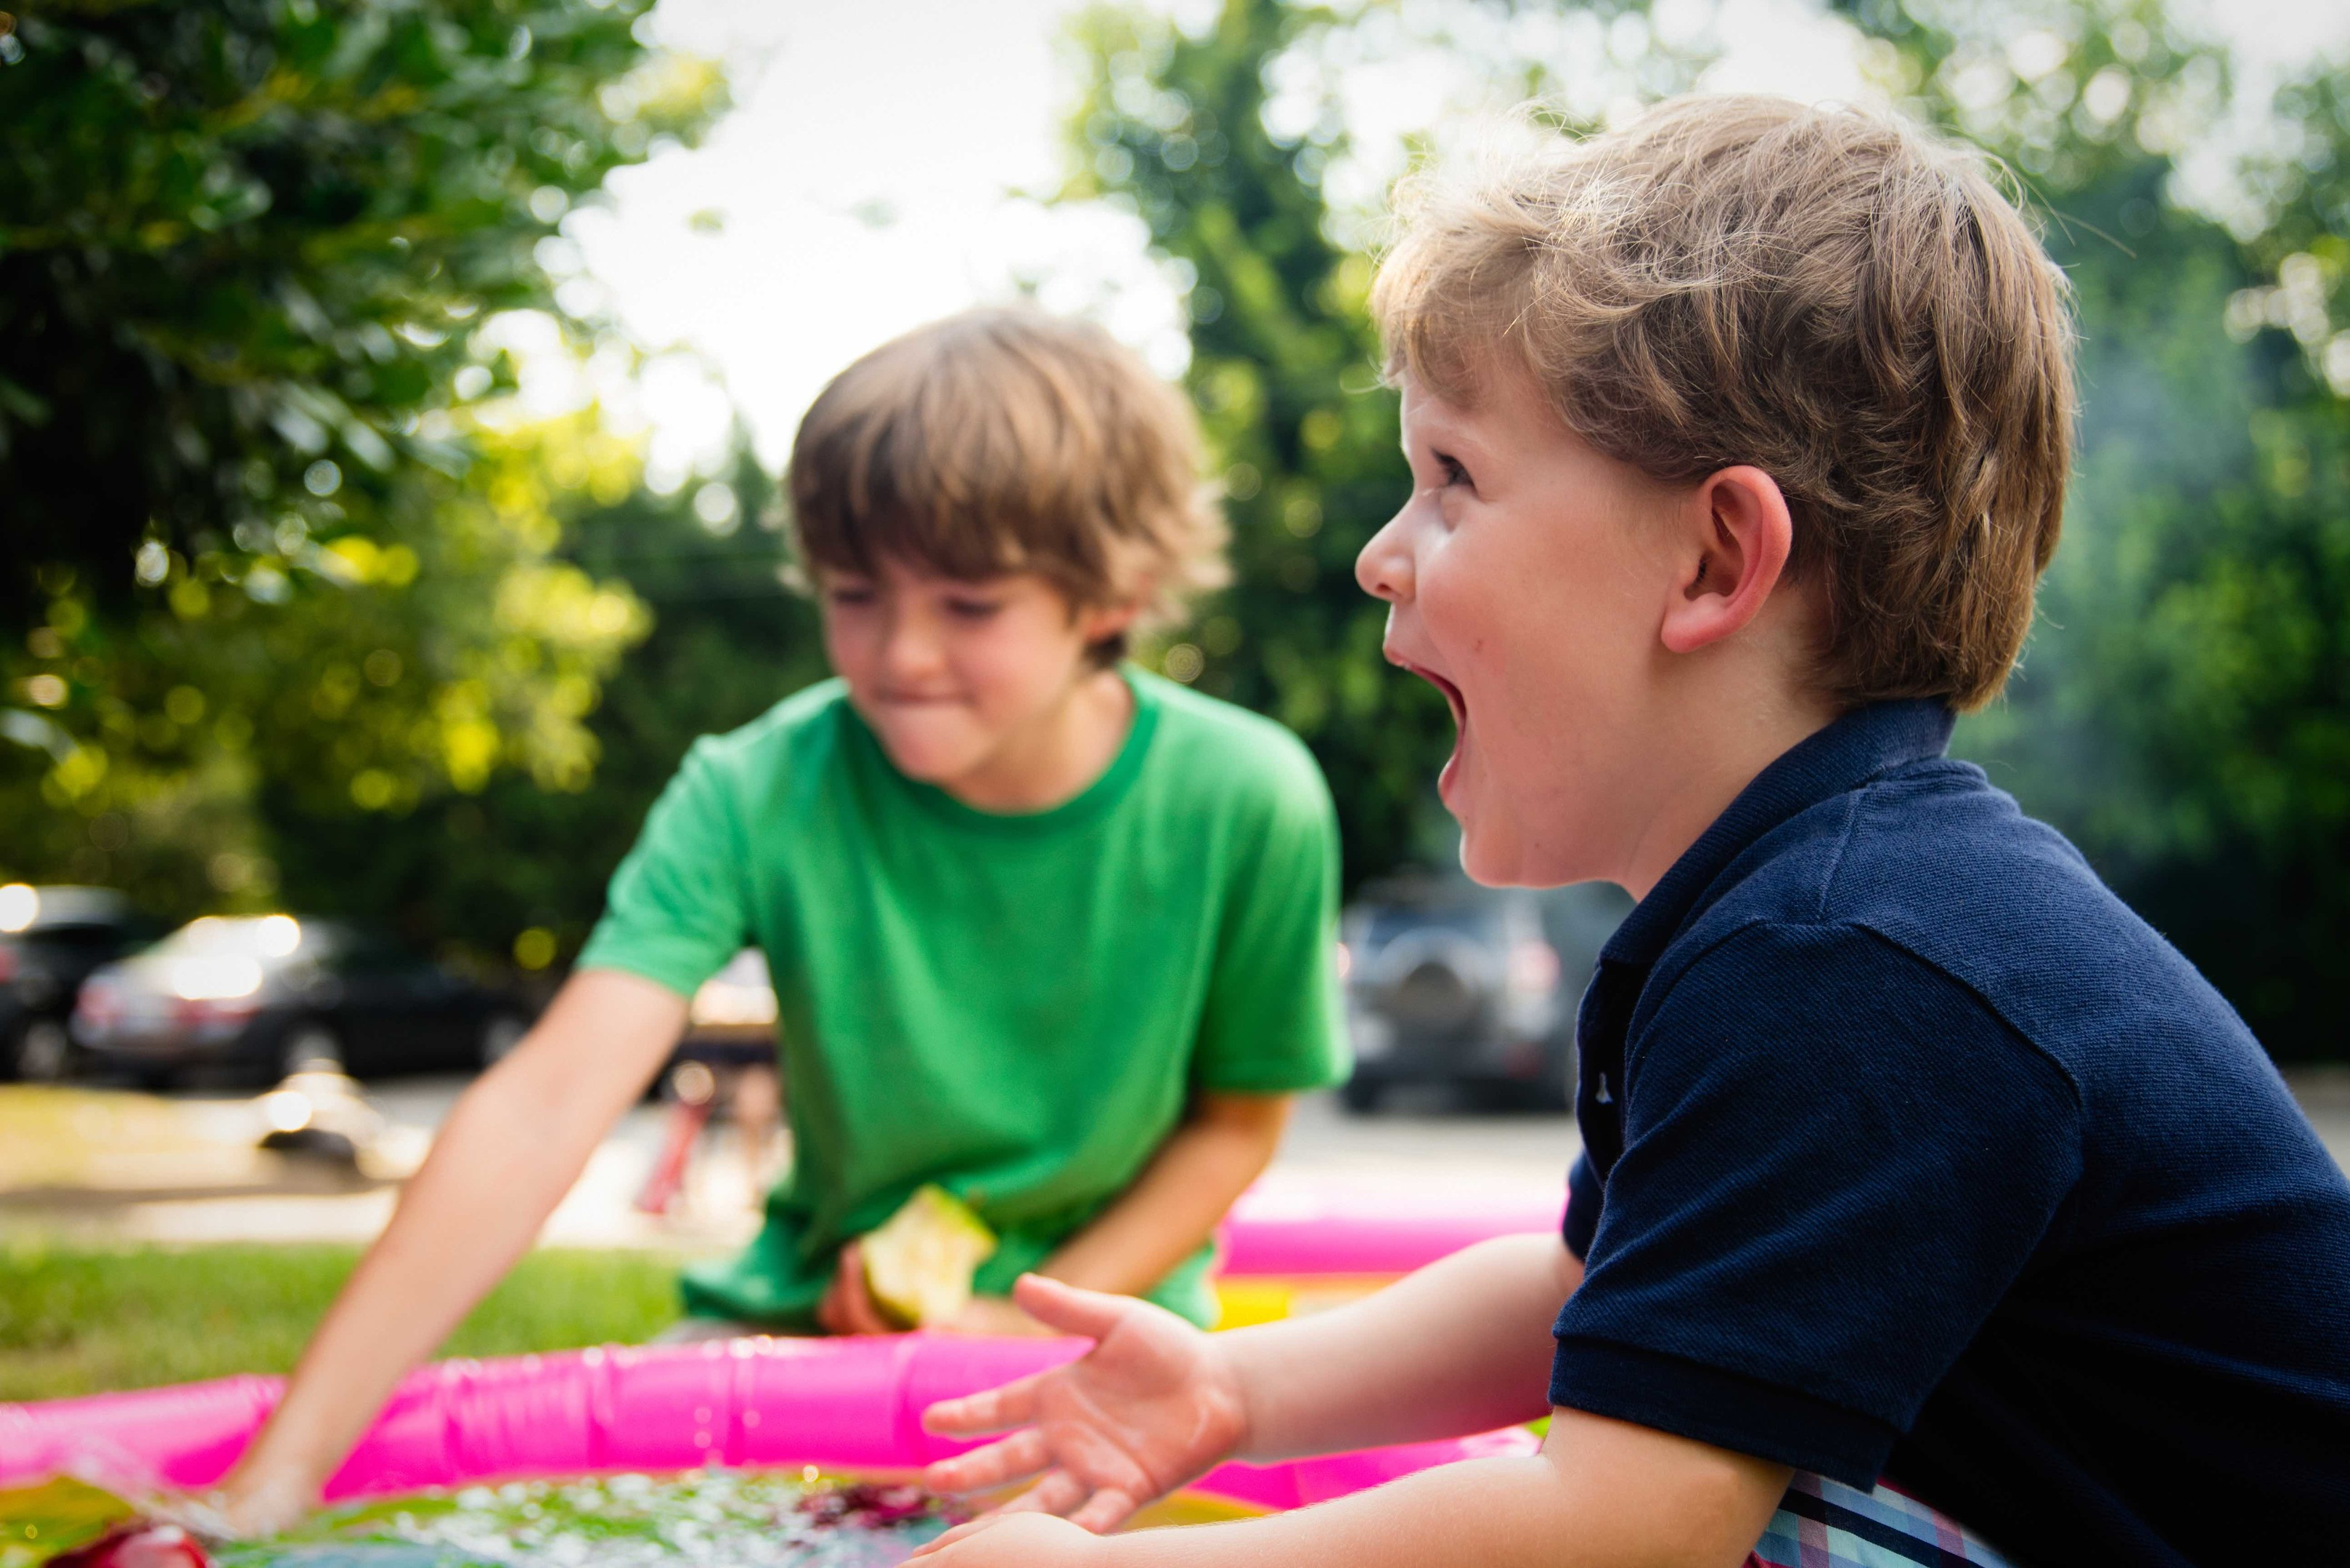 A new study reveals parents' true attitudes towards their kids' pals